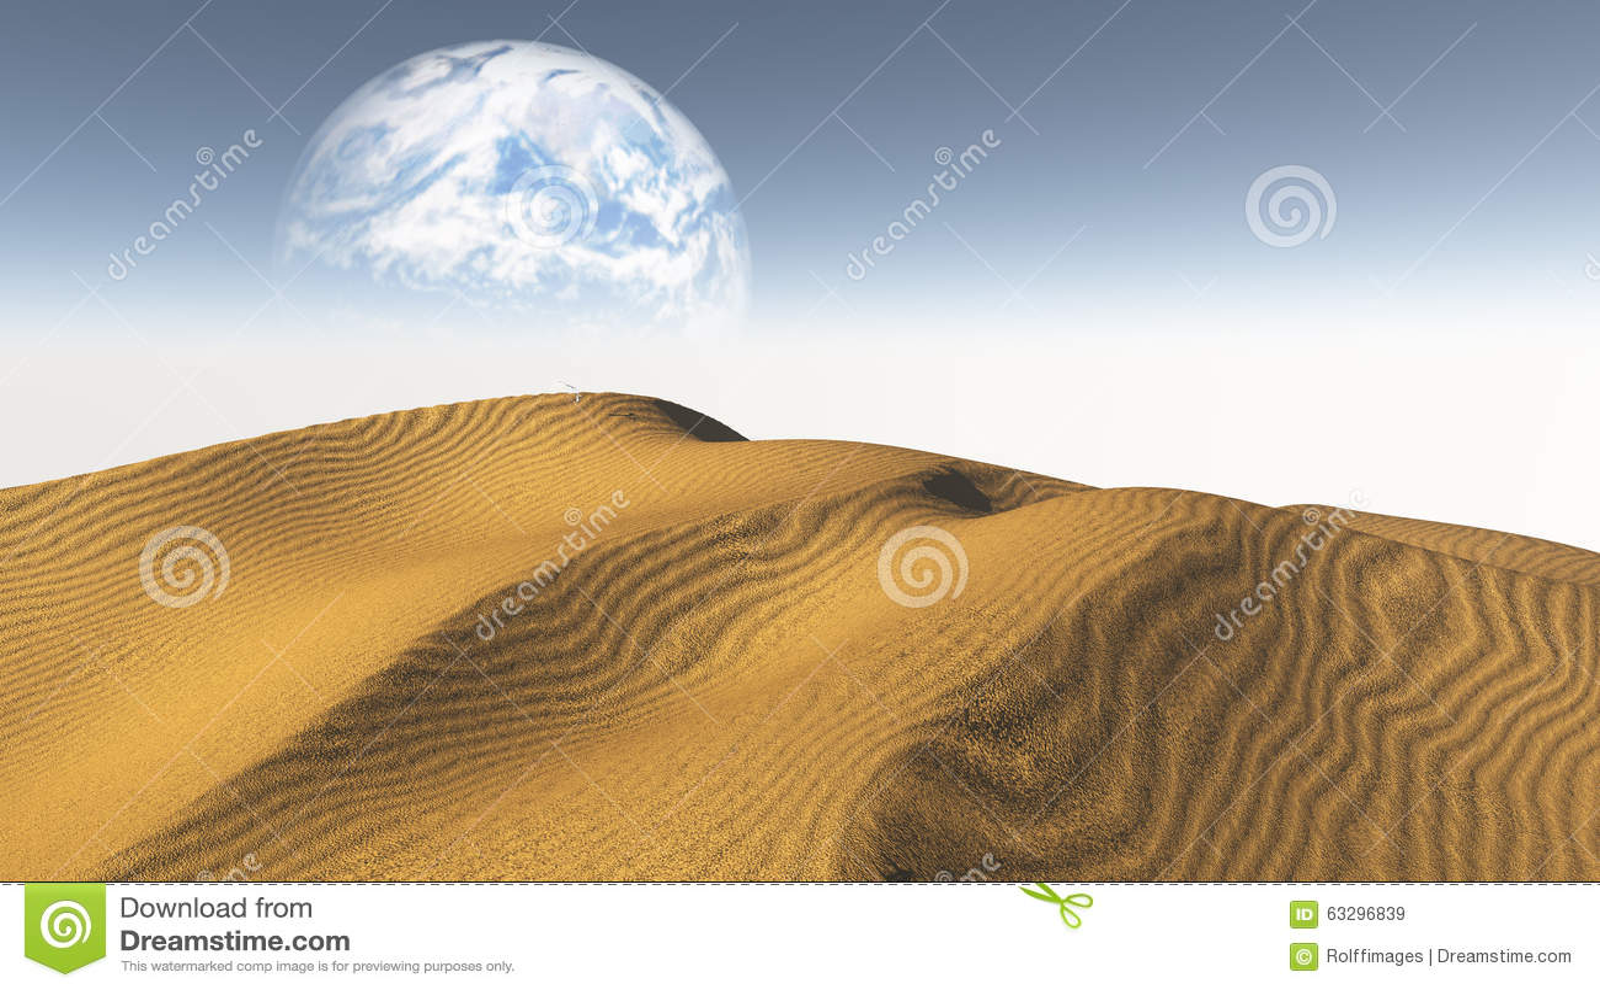 Amber Sand Desert With Terraformed Moon Or Earth From Terraform